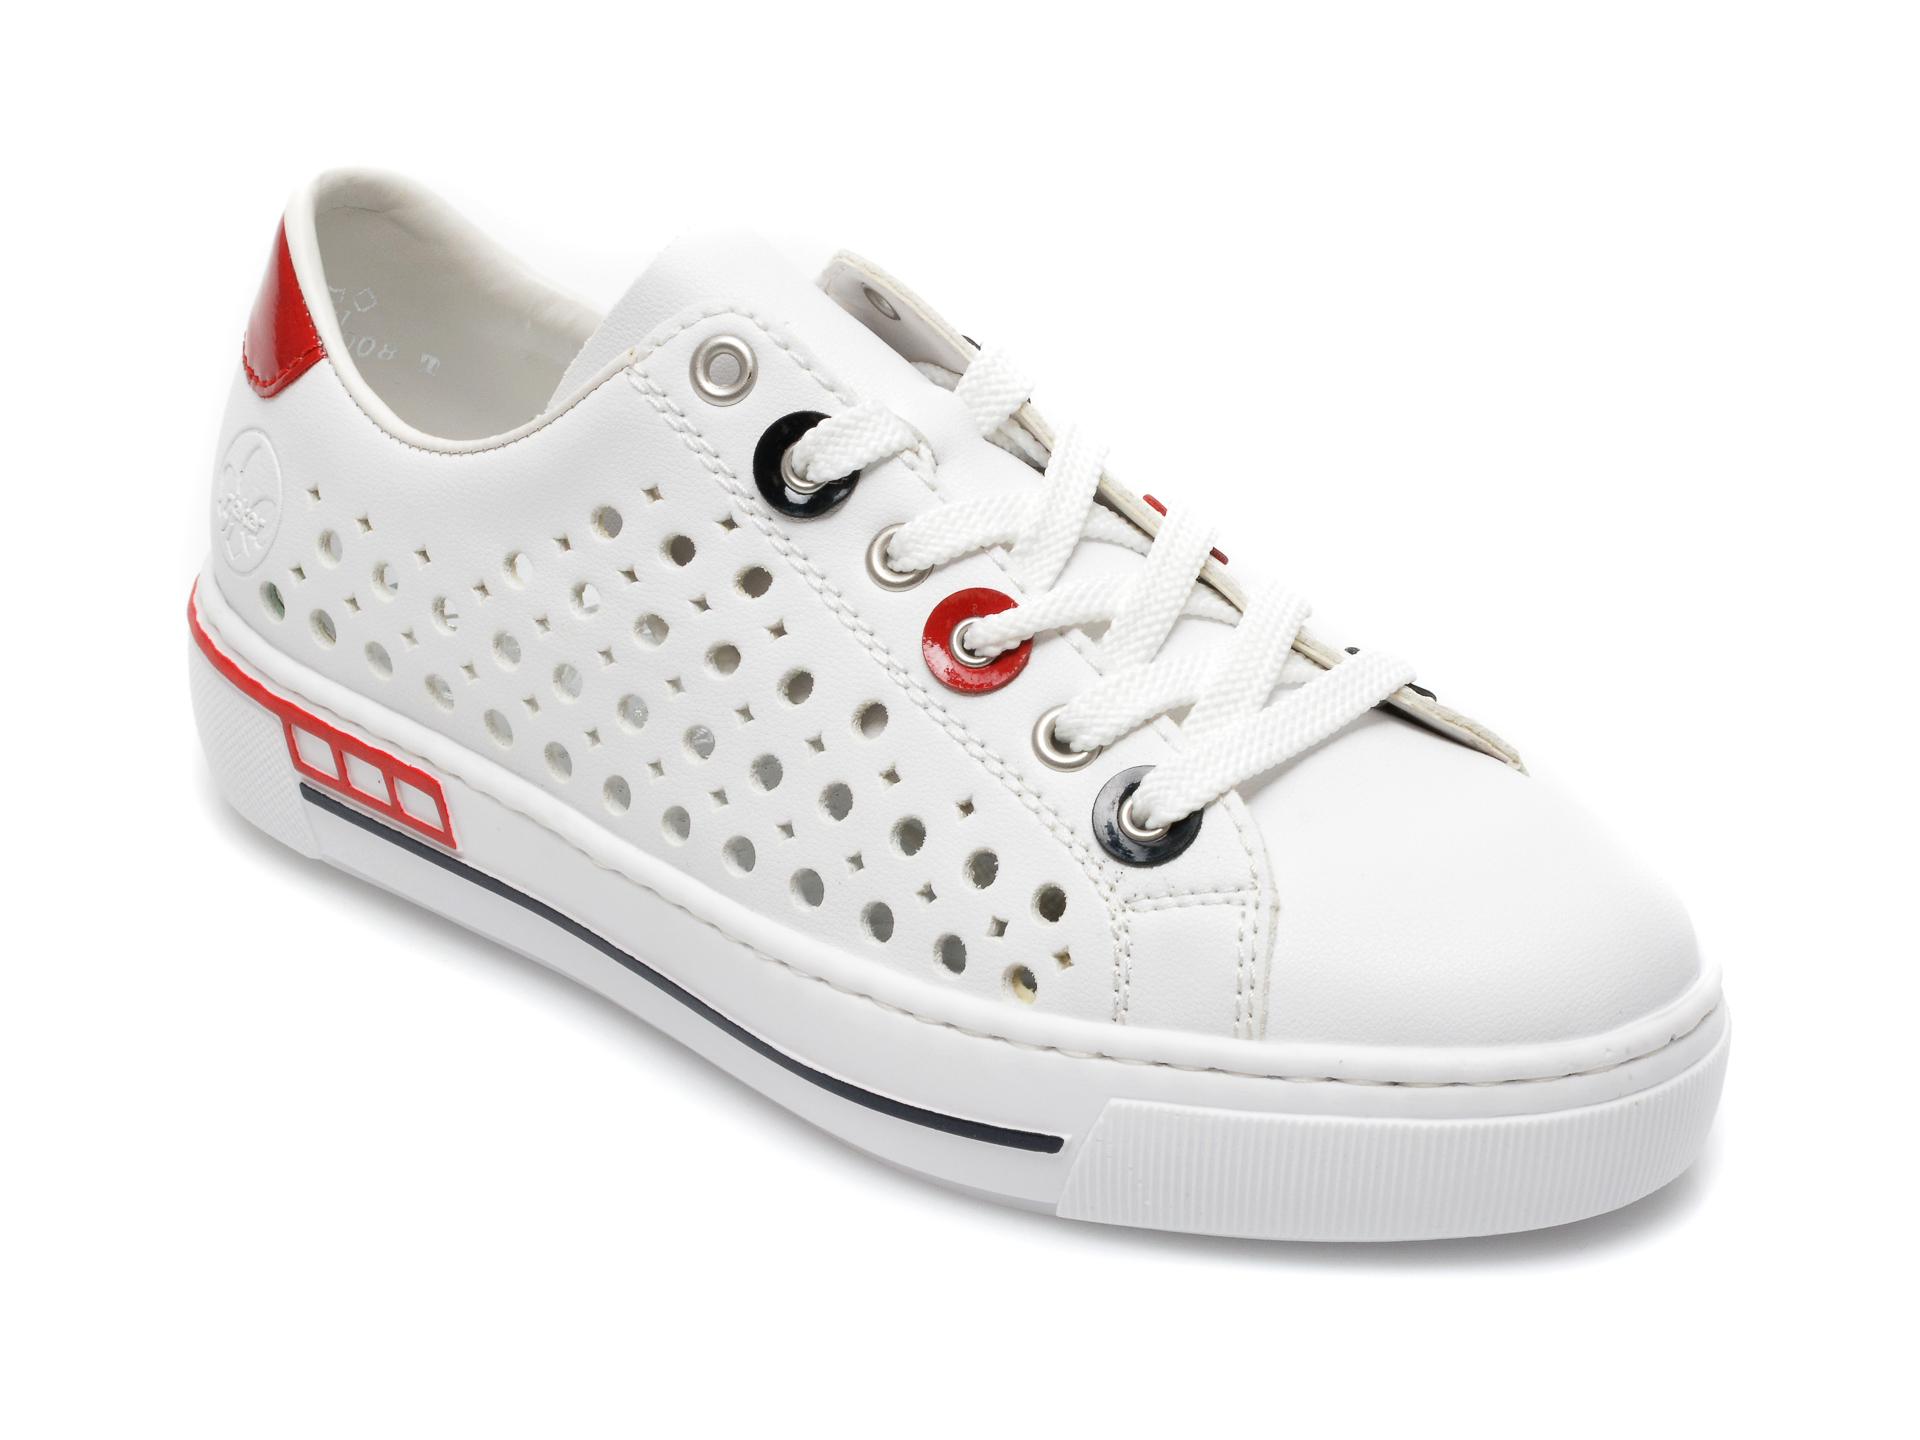 Pantofi sport RIEKER albi, L8895, din piele ecologica imagine otter.ro 2021